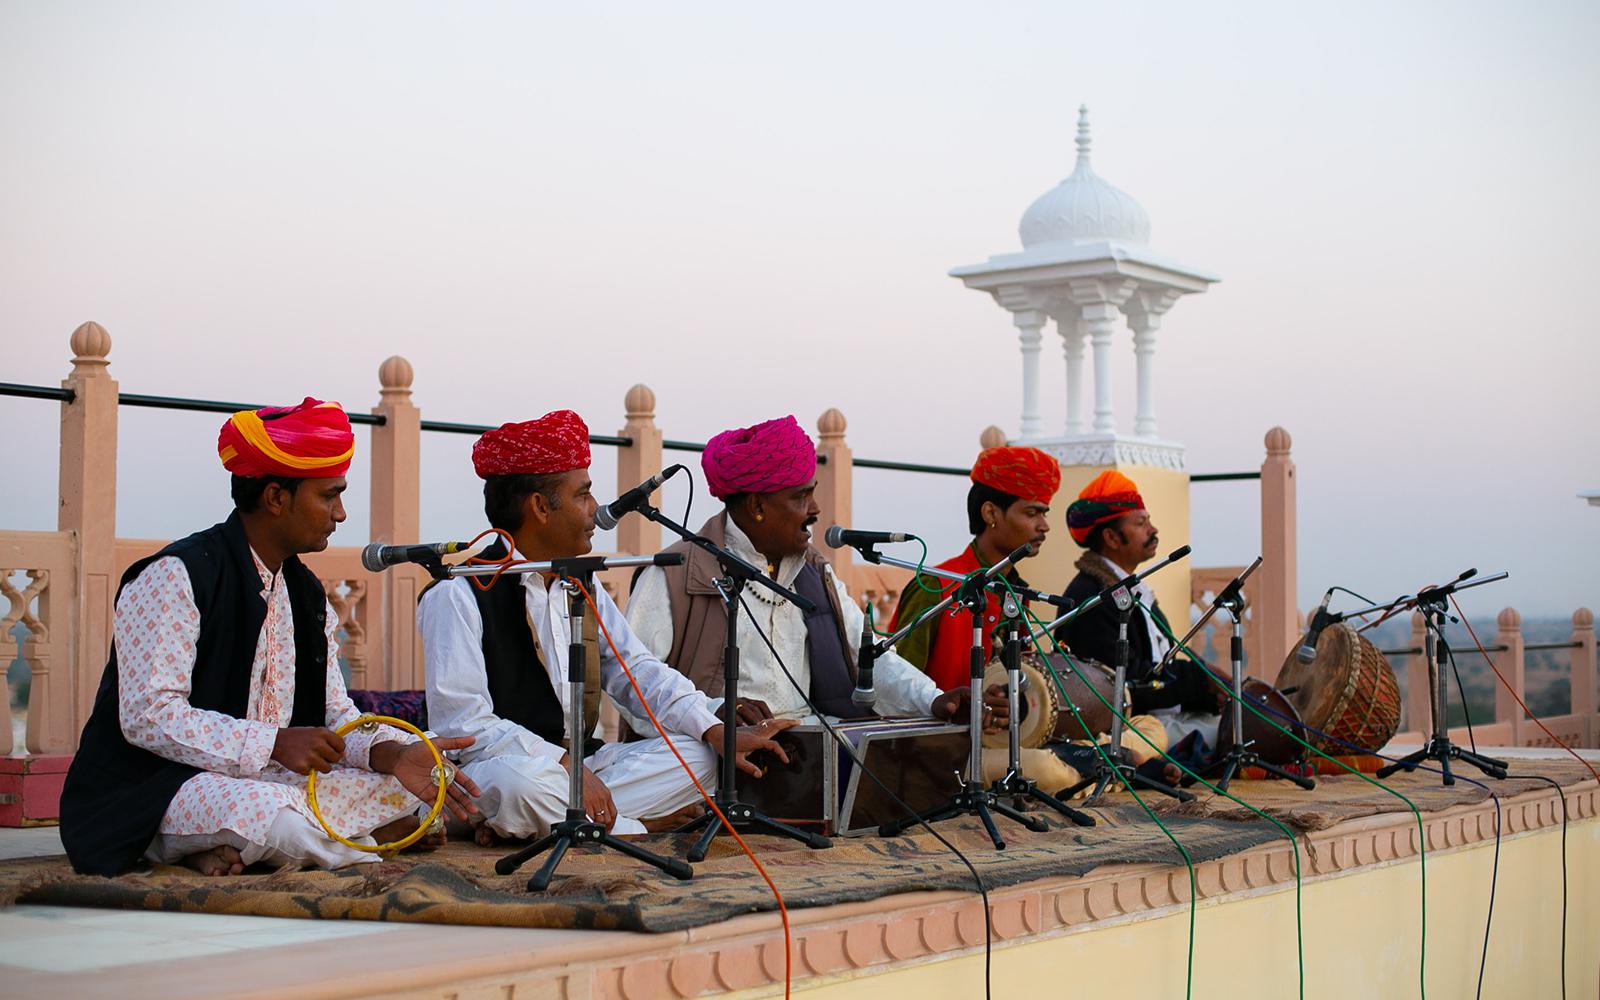 RA: Clubbing in India